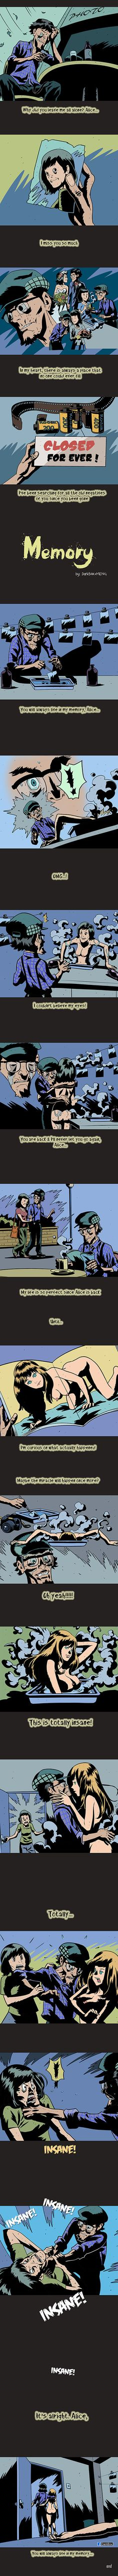 Eternal Memory (NSFW) | By DarkBox + MENG [Comic - Illustration - Short Stories - Photography - Love - Horror]